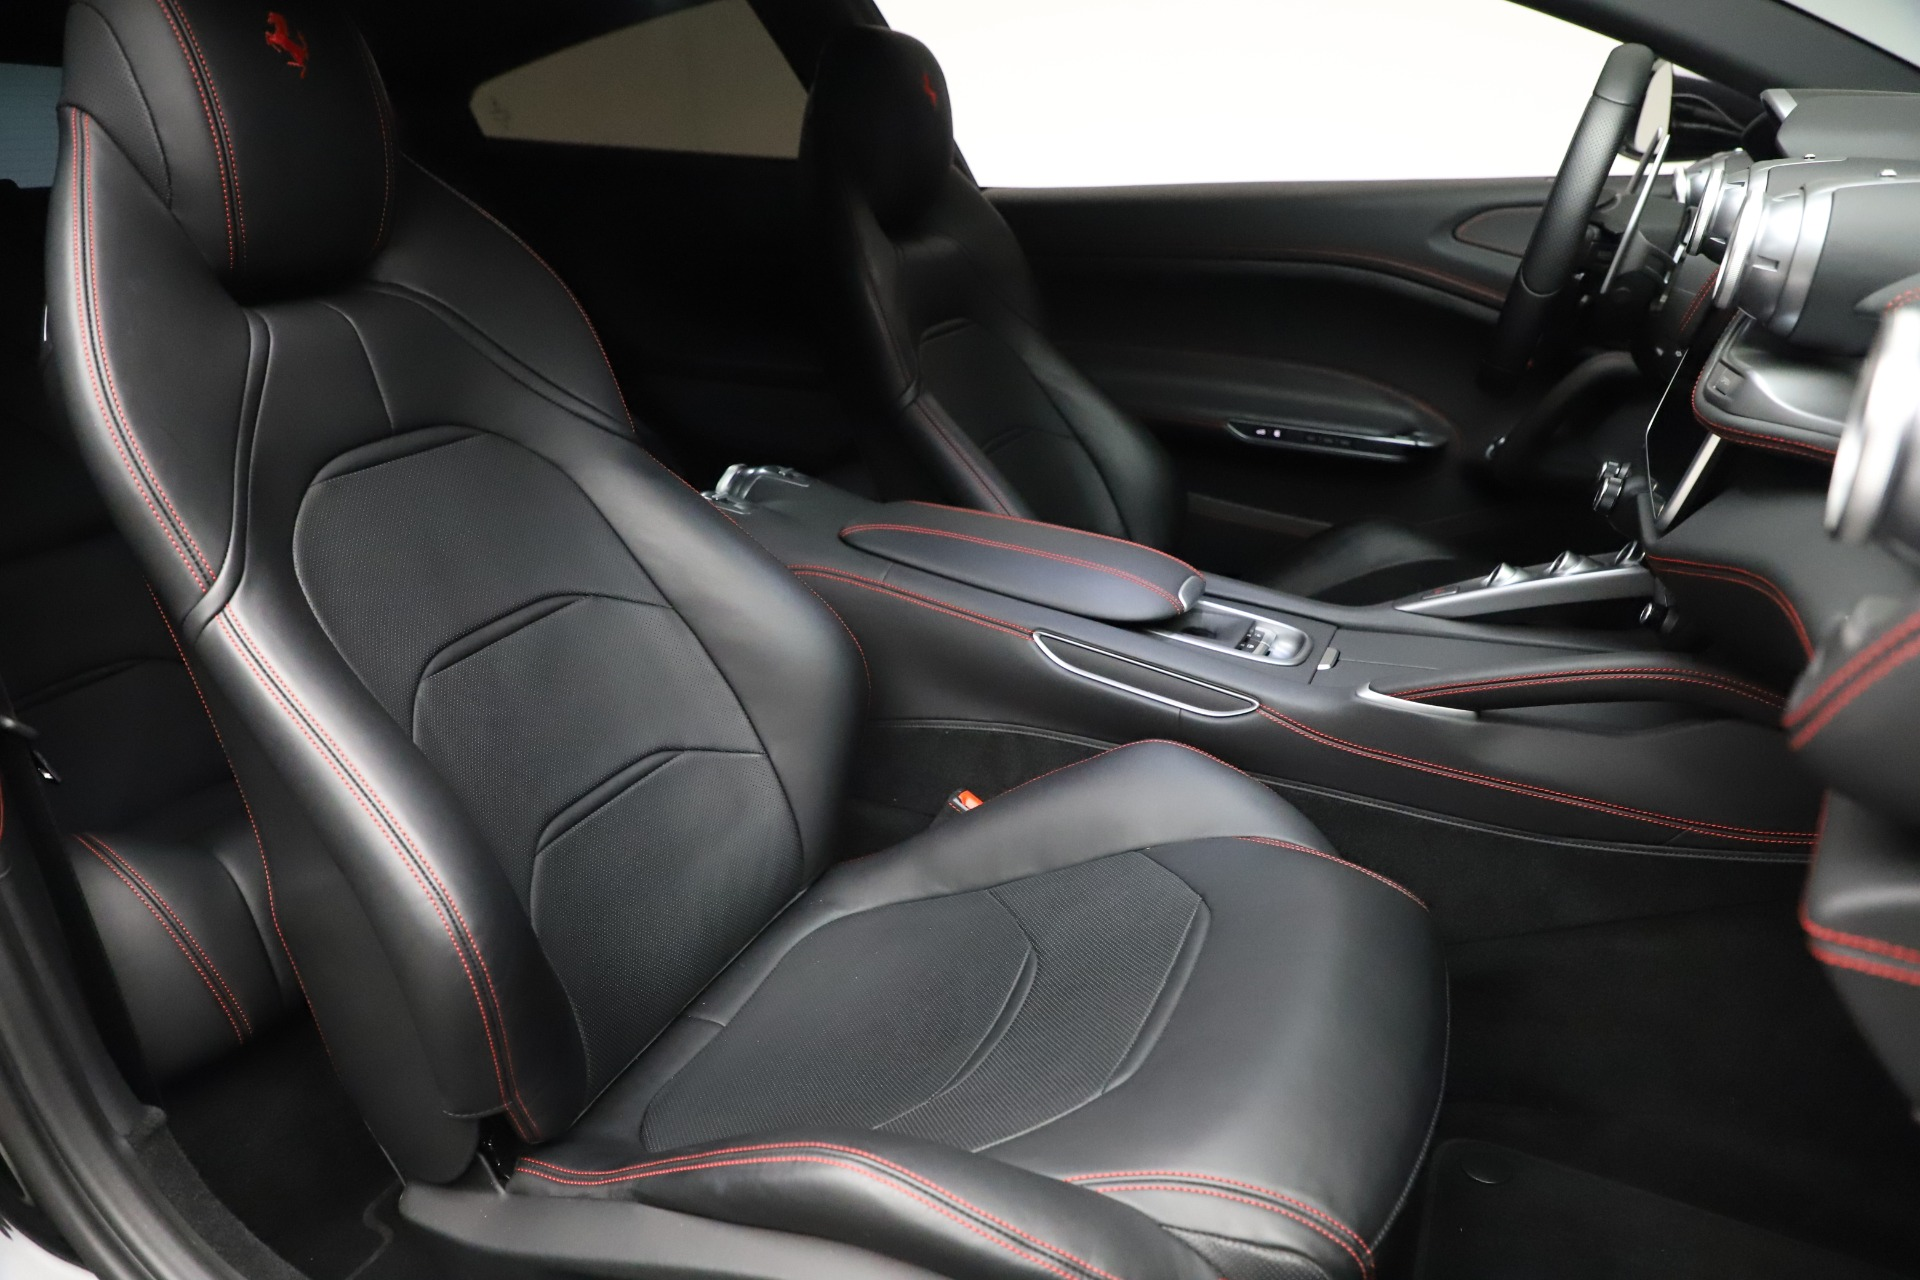 Used 2018 Ferrari GTC4Lusso  For Sale In Greenwich, CT 3005_p19